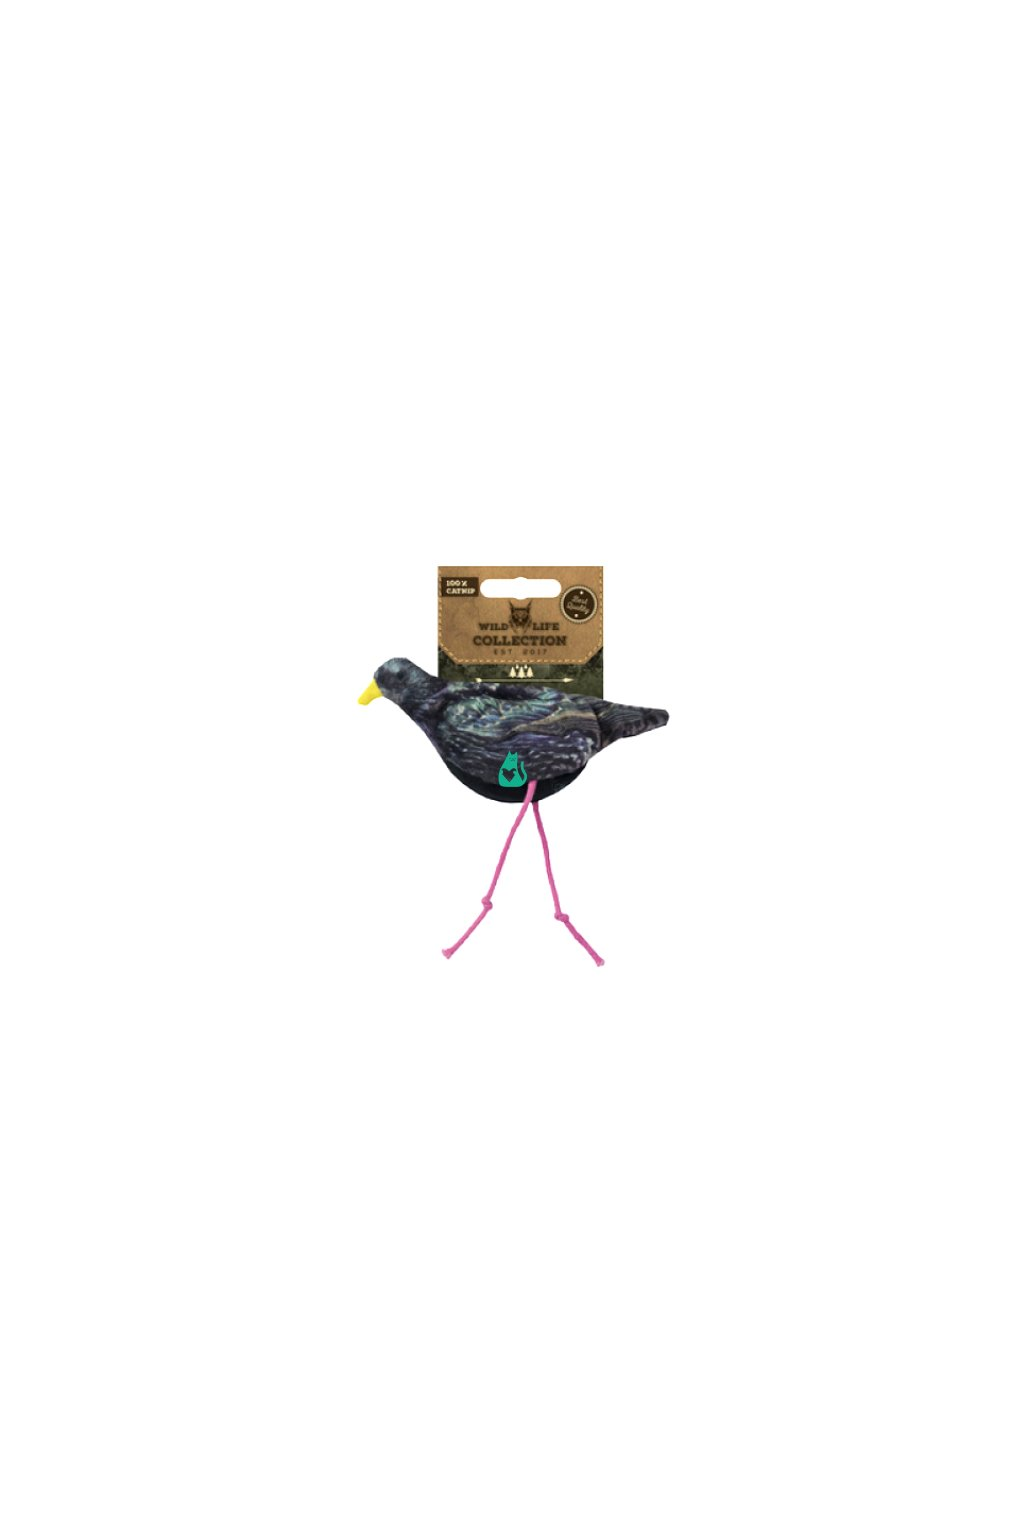 spacek catnip hracka pro kocky